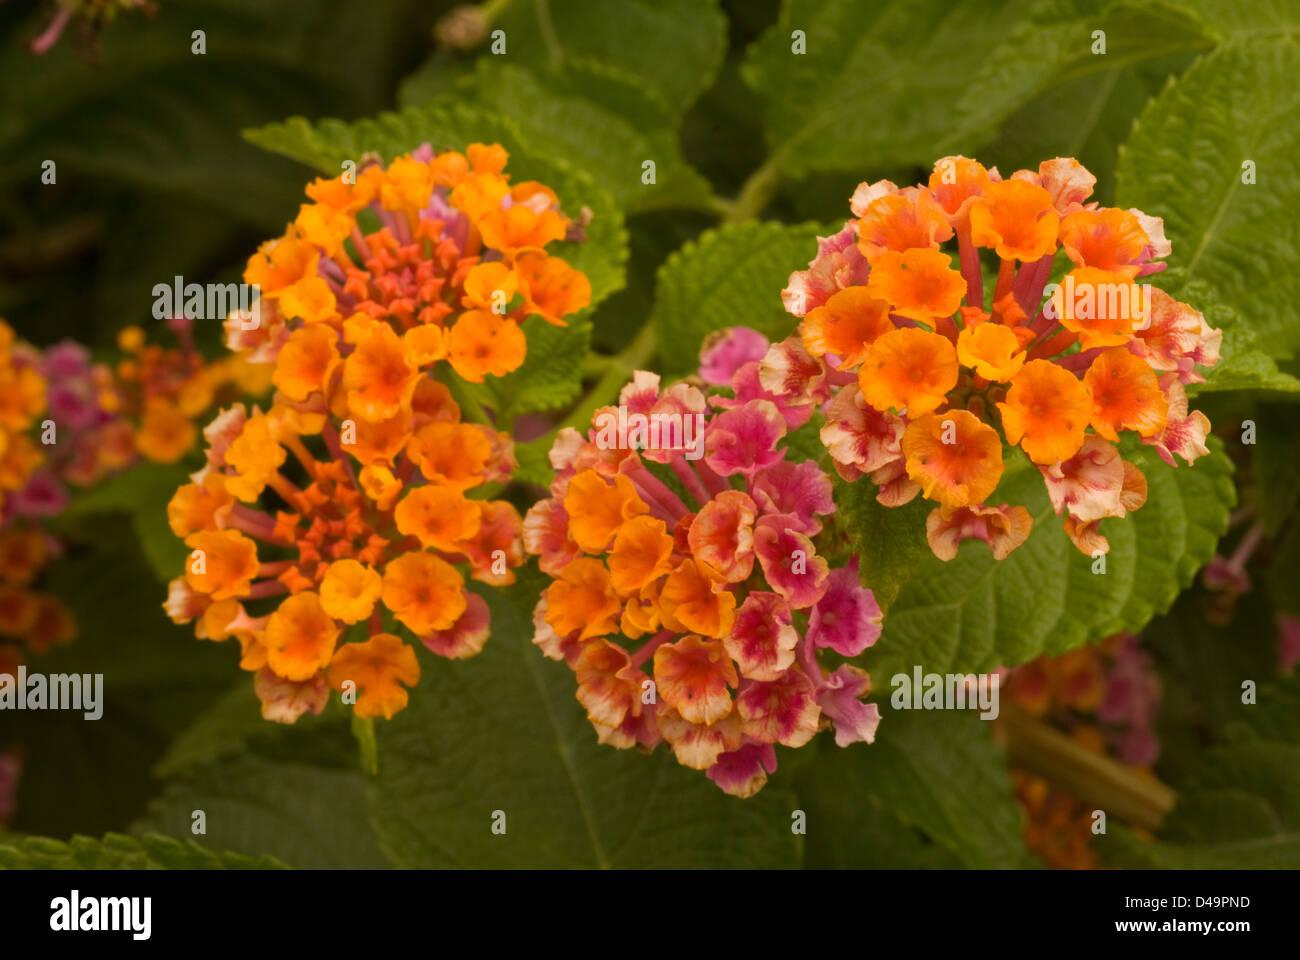 Flowers of Lantana camara, Verbenaceae Stock Photo